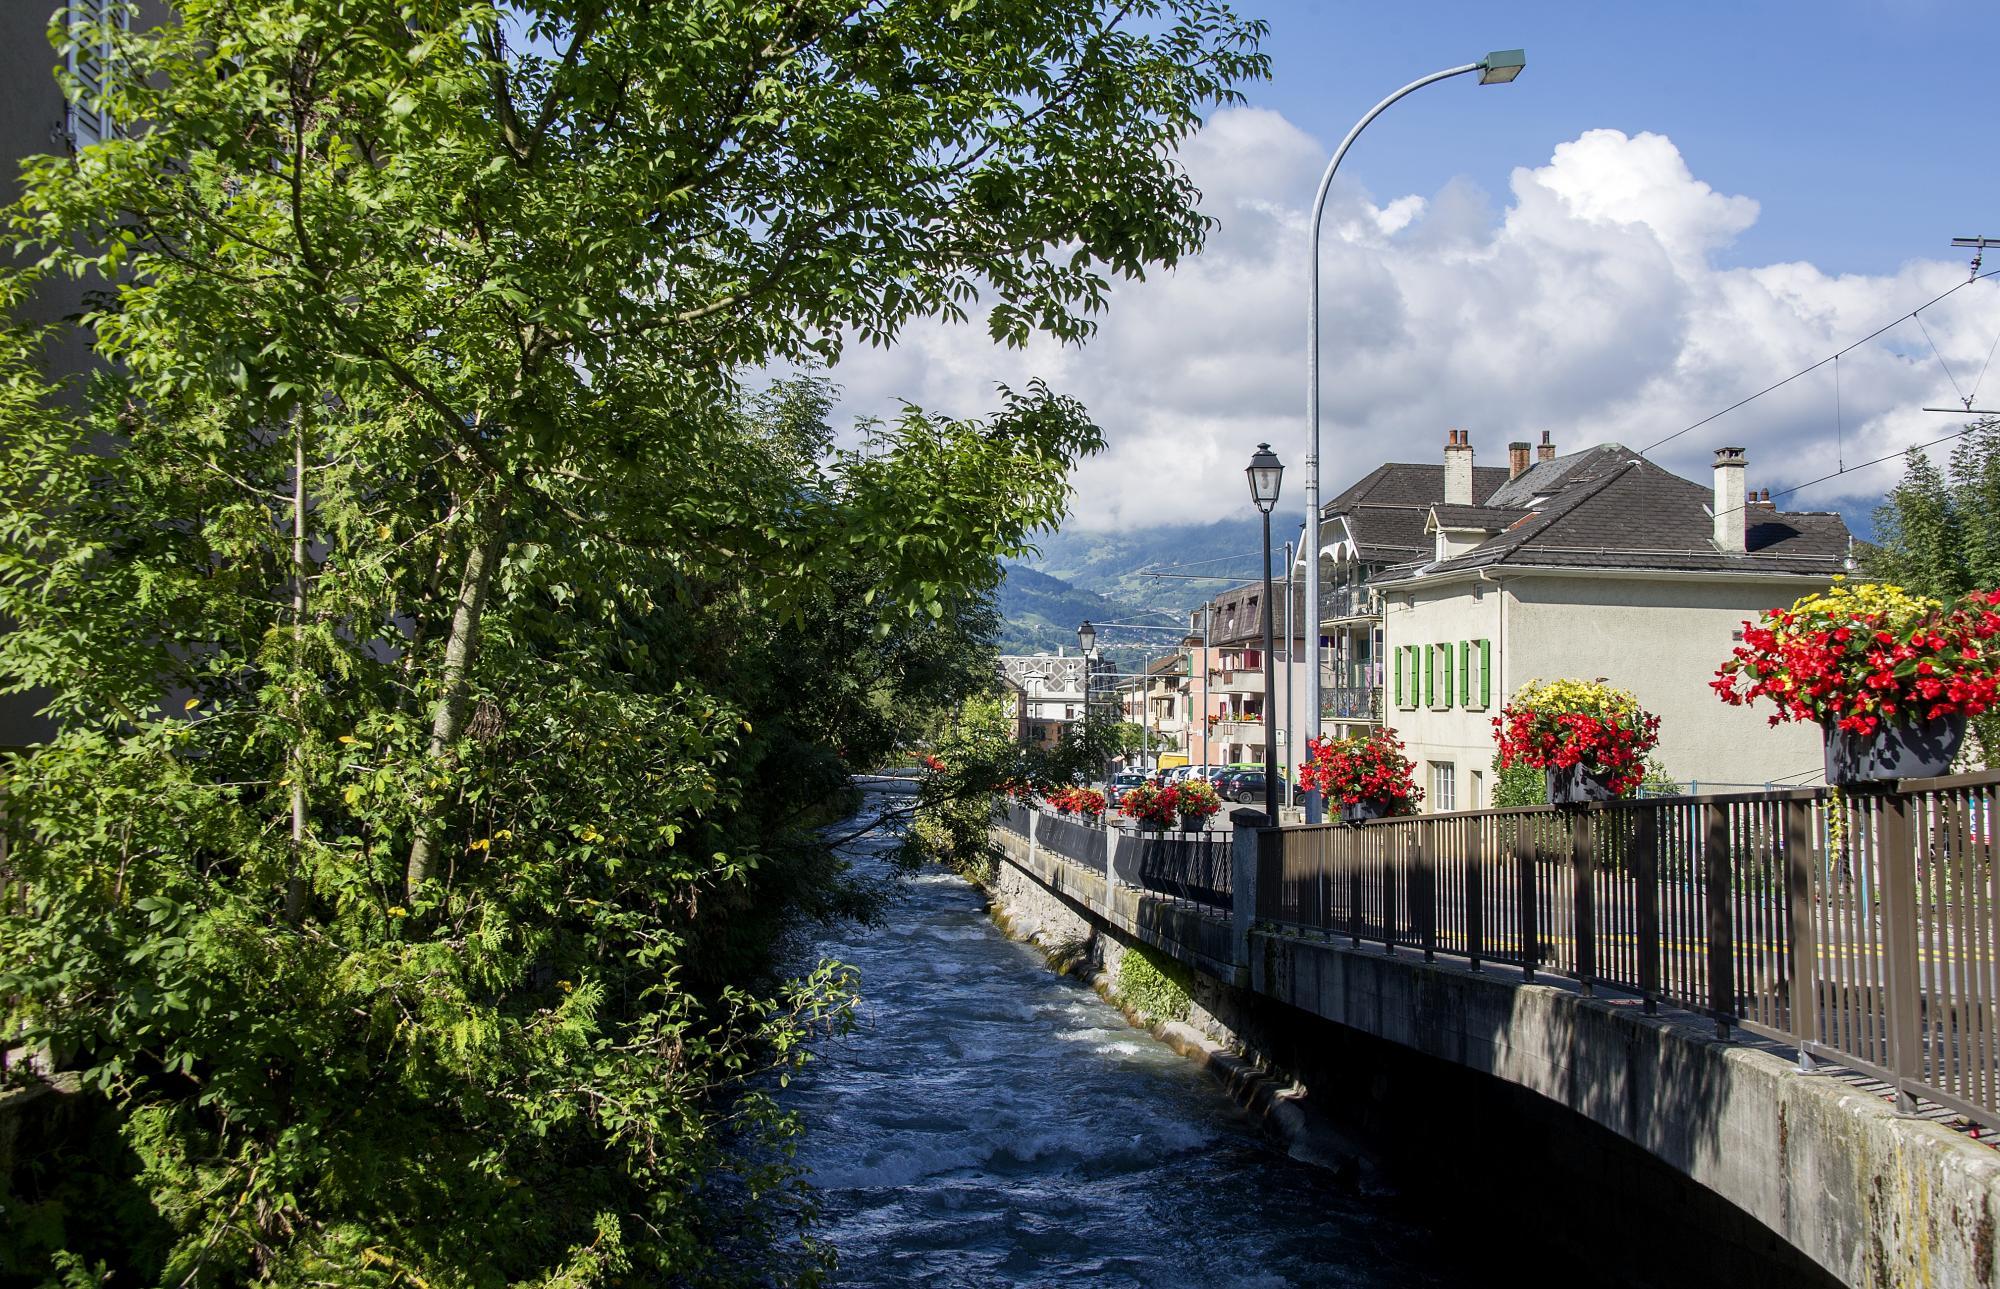 Strolls in the village of Bex - Villars-Gryon – Les Diablerets – Bex ...